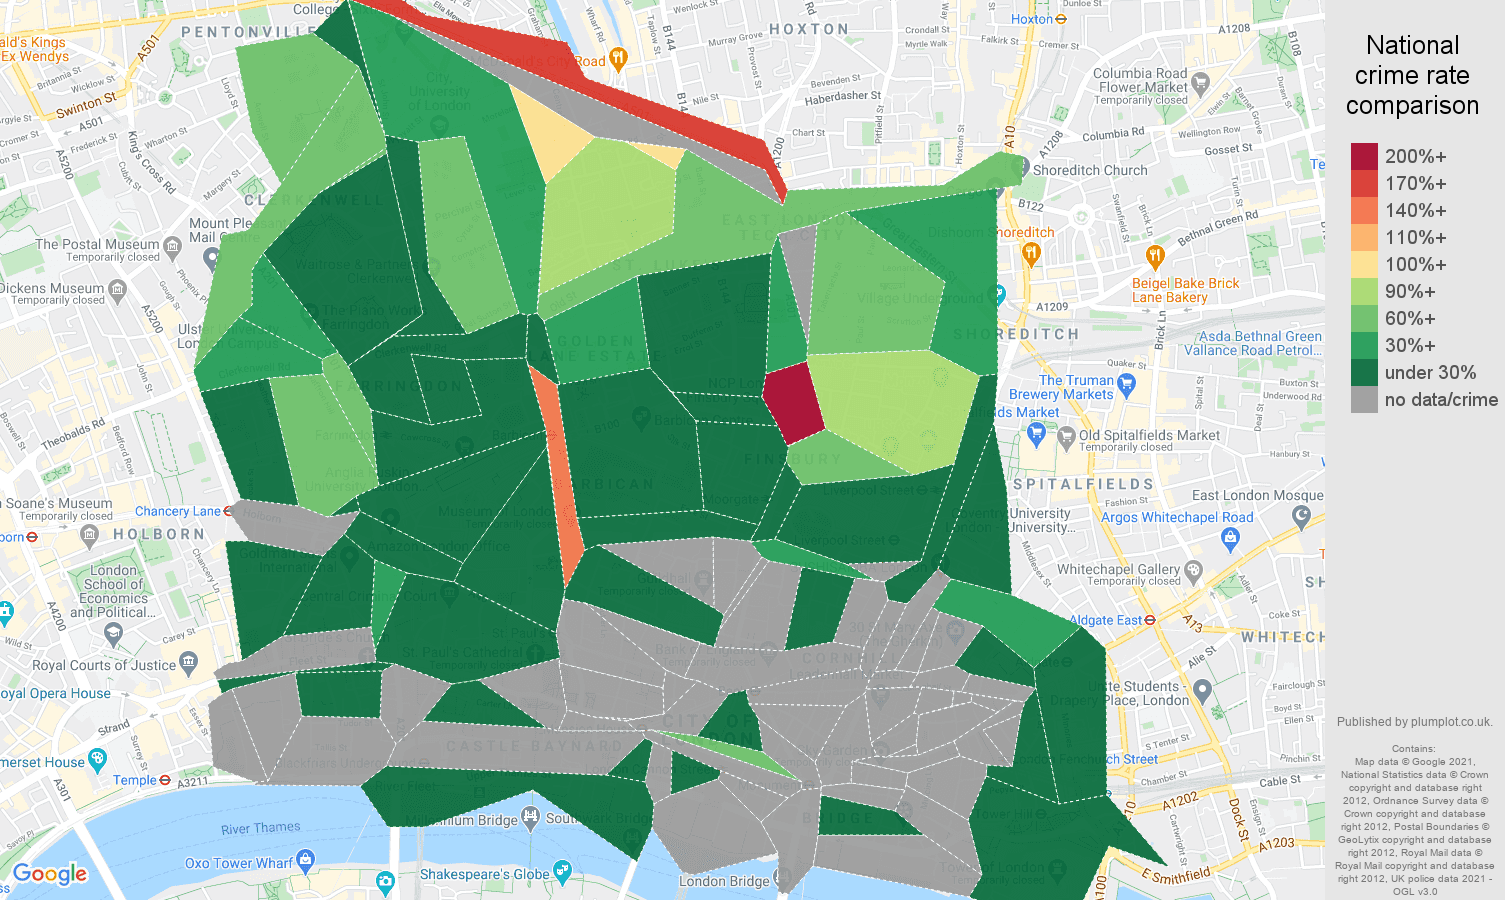 East Central London vehicle crime rate comparison map